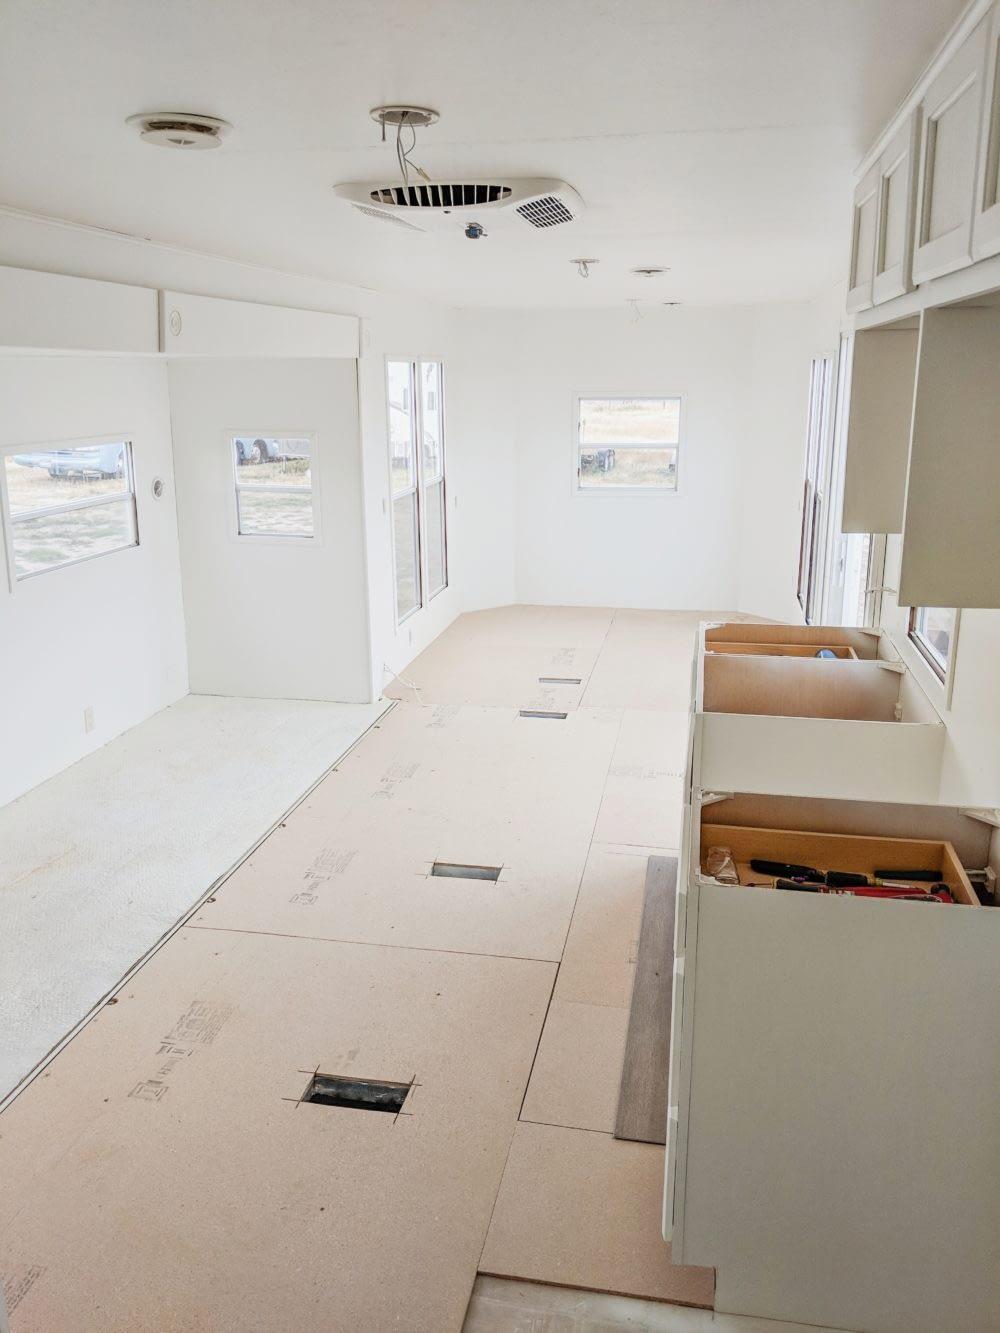 RV interior walls painted white